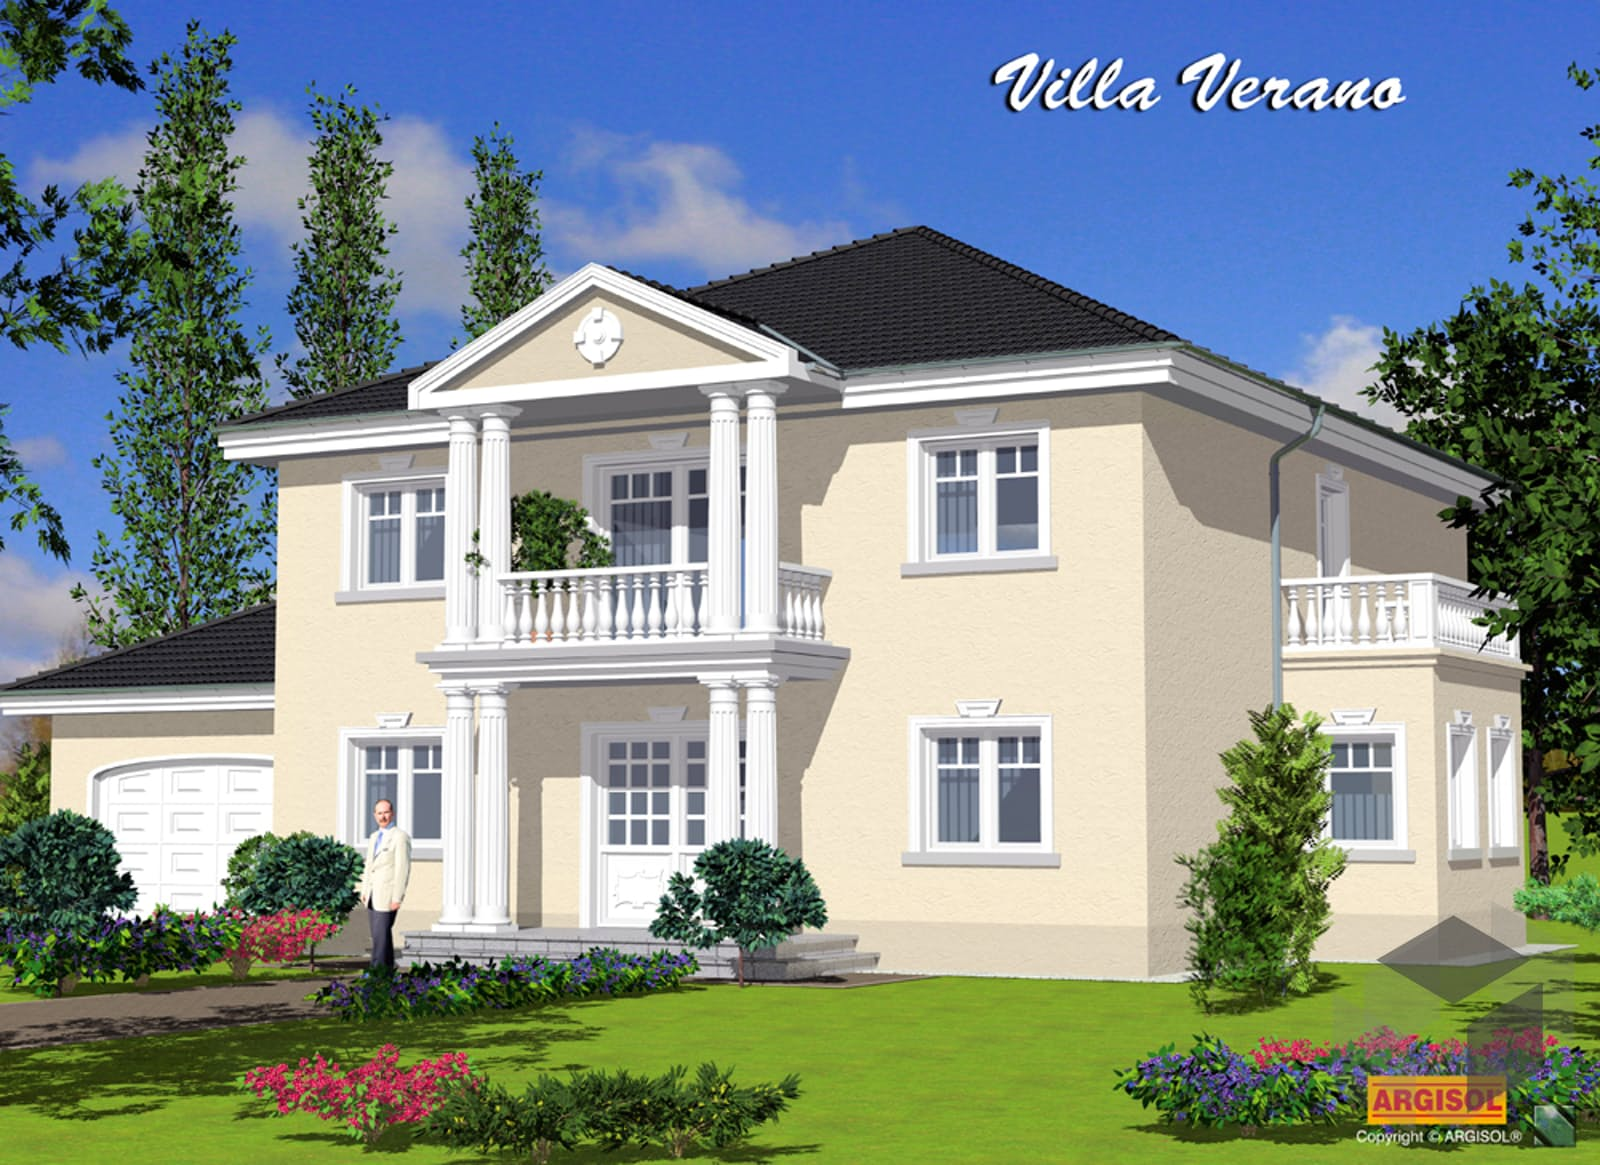 villa verano von argisol bausysteme bewa gmbh. Black Bedroom Furniture Sets. Home Design Ideas